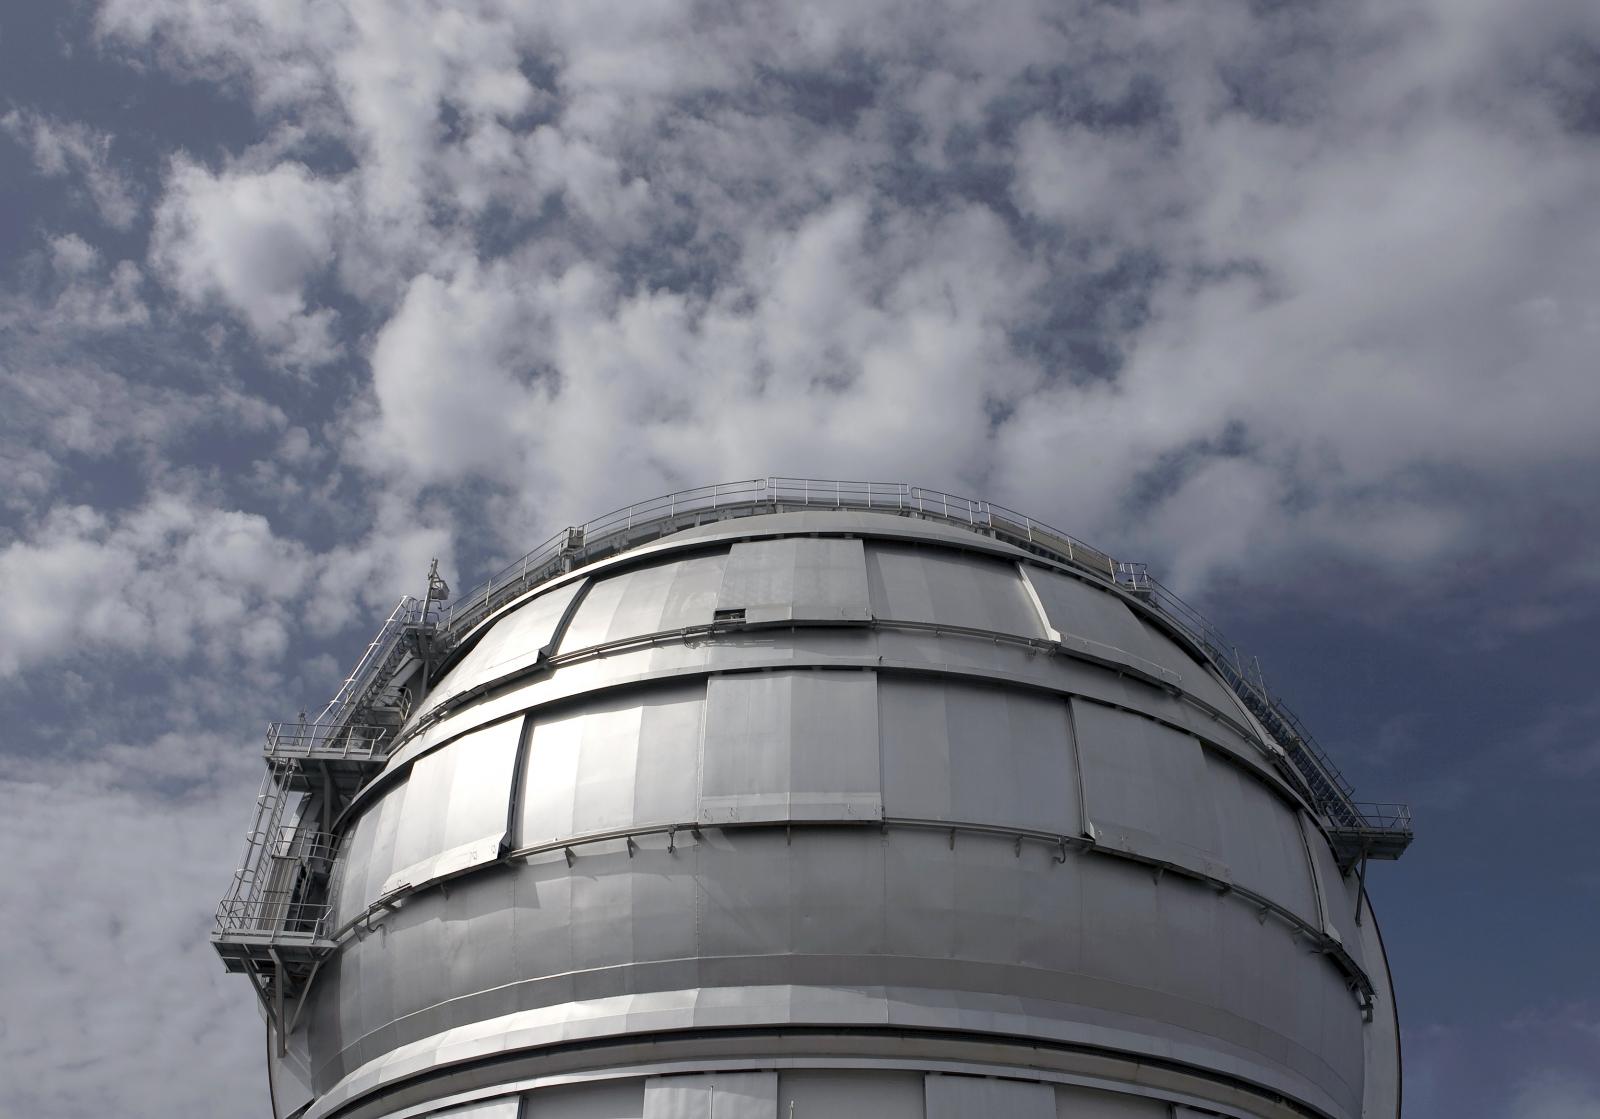 TELESCOPE SPAIN